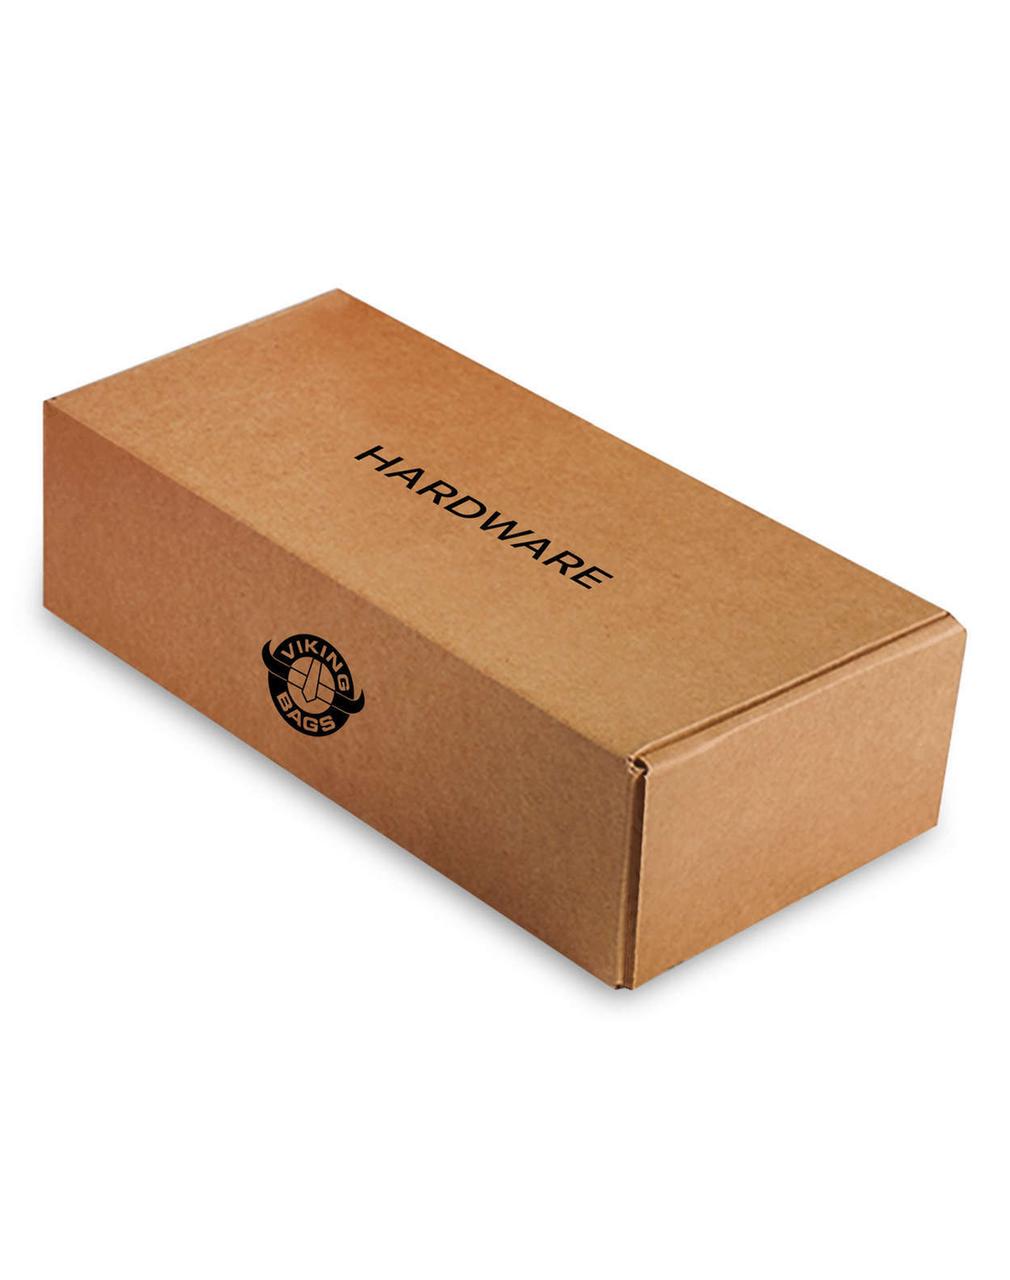 Honda CMX 250C Rebel 250 Charger Single Strap Studded Medium Motorcycle Saddlebags Hardware Box